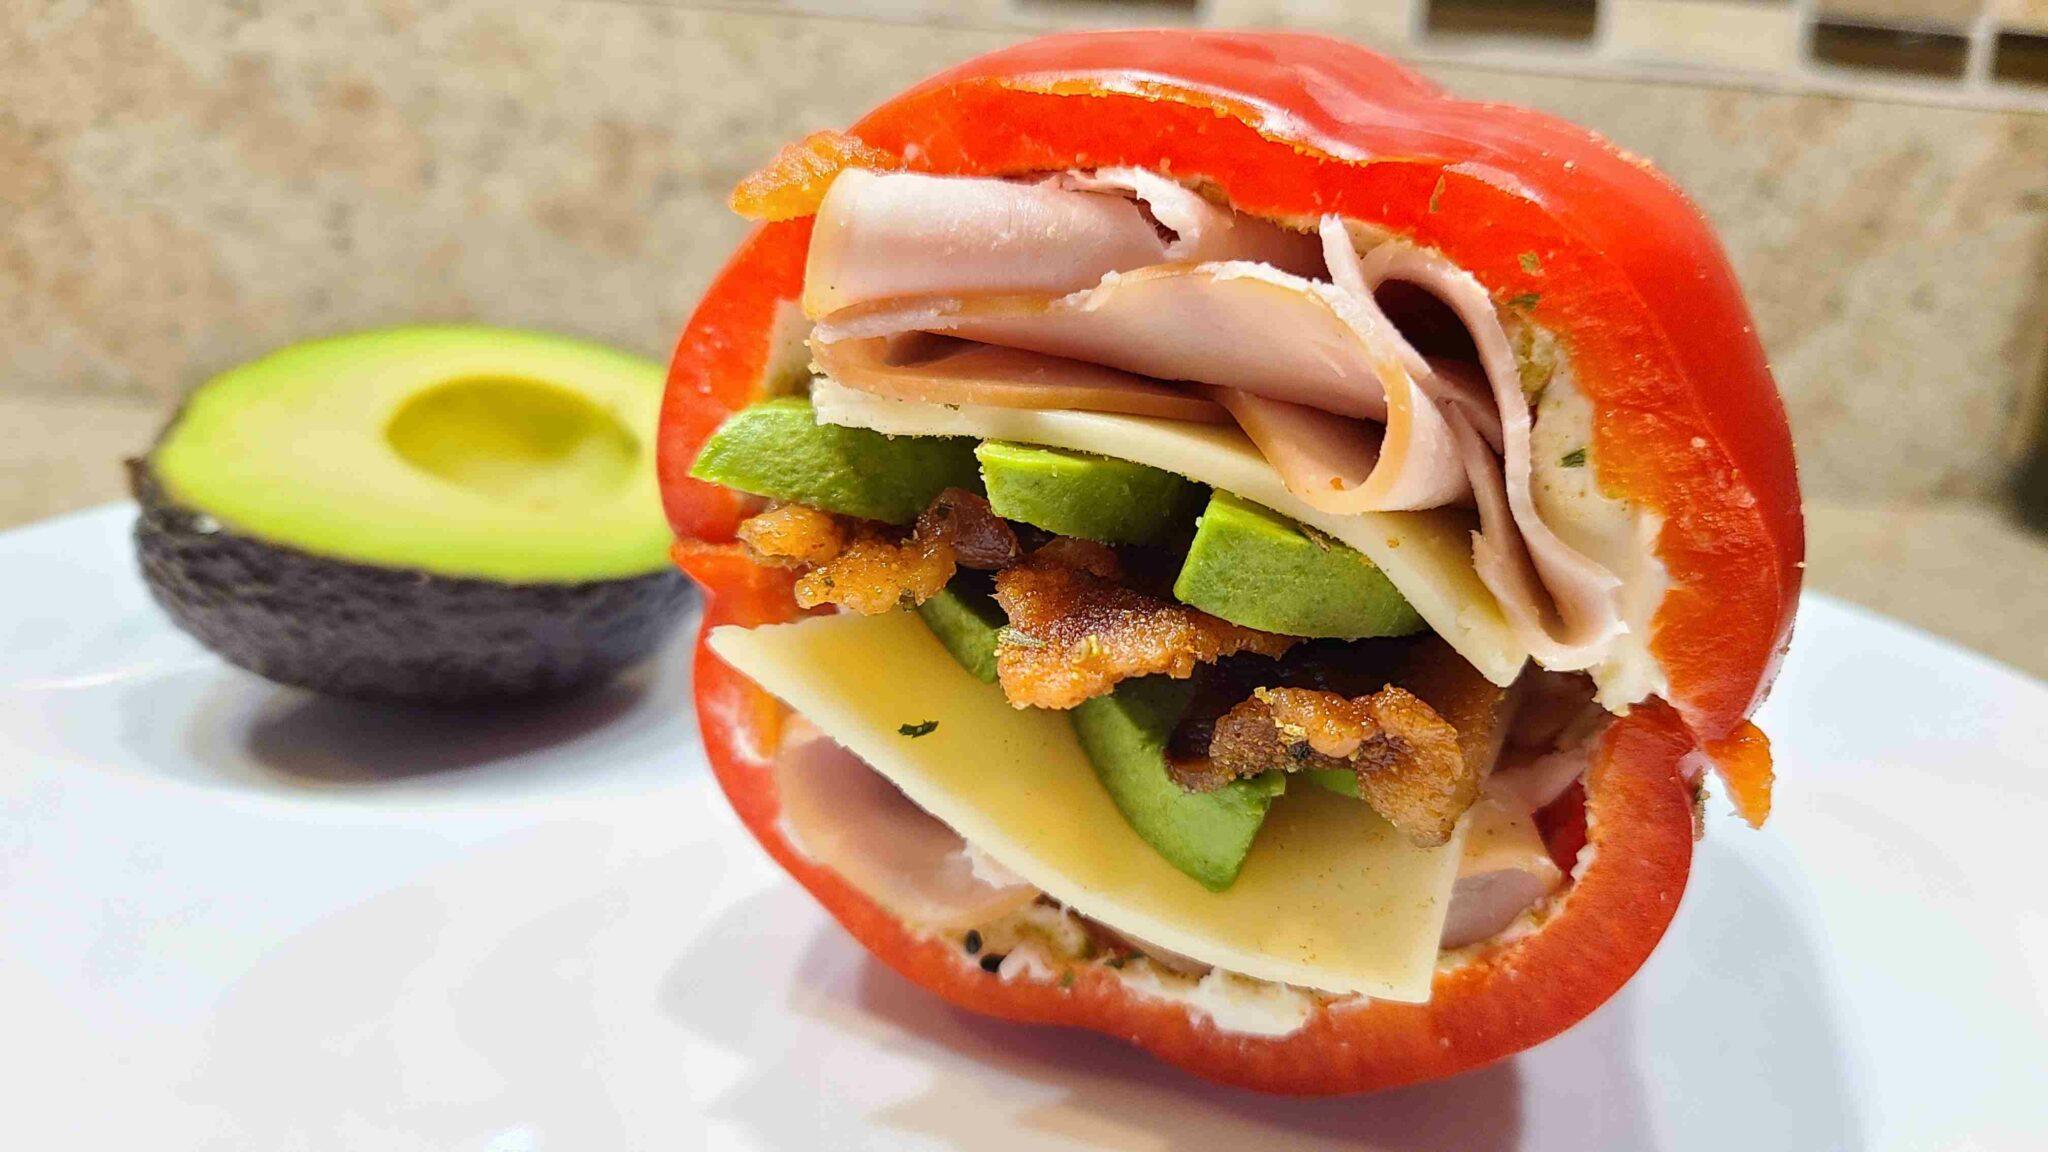 Bell Pepper Sandwich with avocado